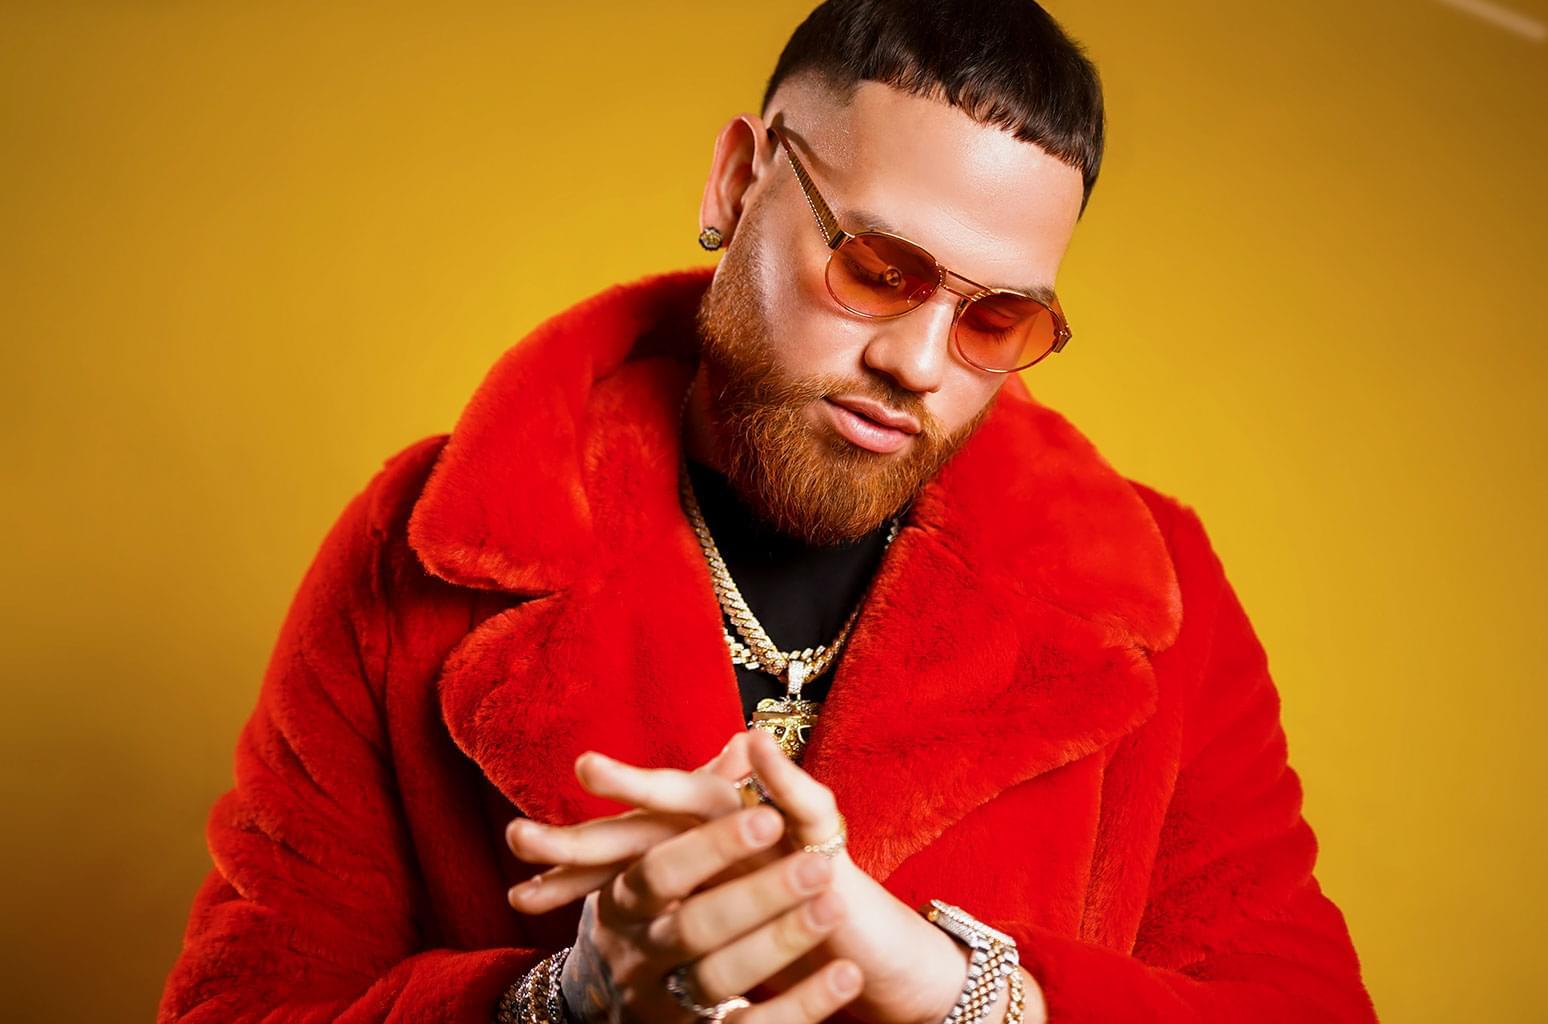 Billboard Latin Artist On The Rise: Puerto Rican Rapper Miky Woodz